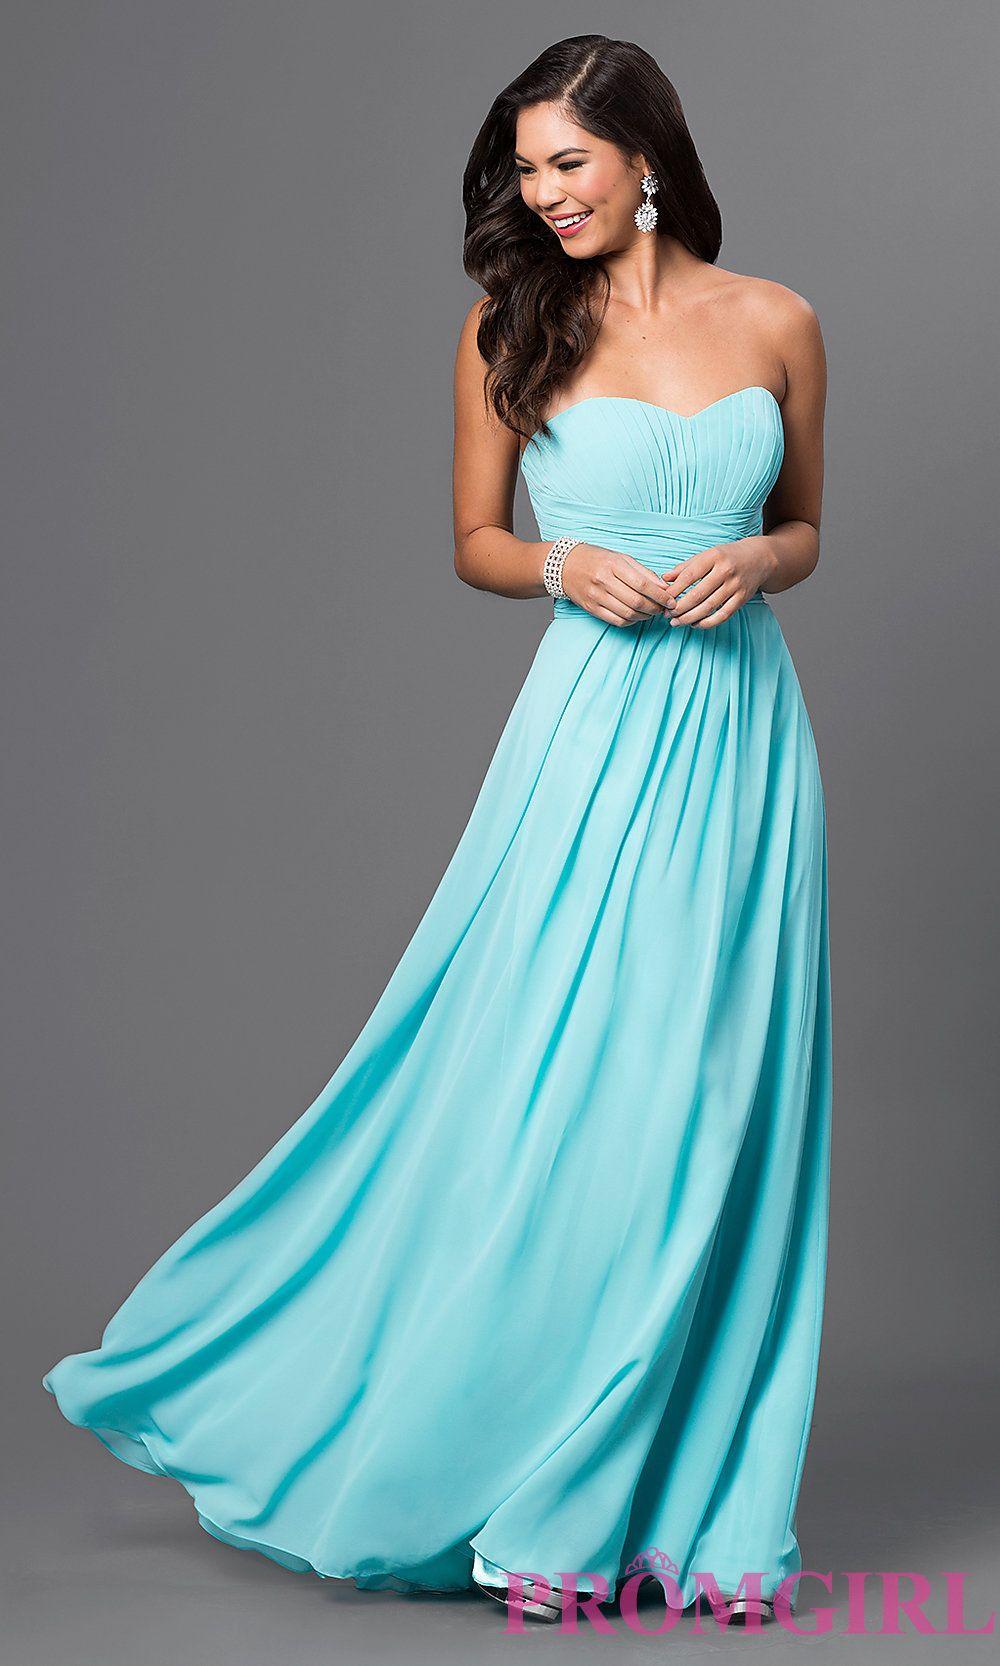 Long Strapless Chiffon Prom Dress With Corset Bridesmaid Dresses Plus Size Strapless Dress Formal Strapless Evening Dress [ 1666 x 1000 Pixel ]